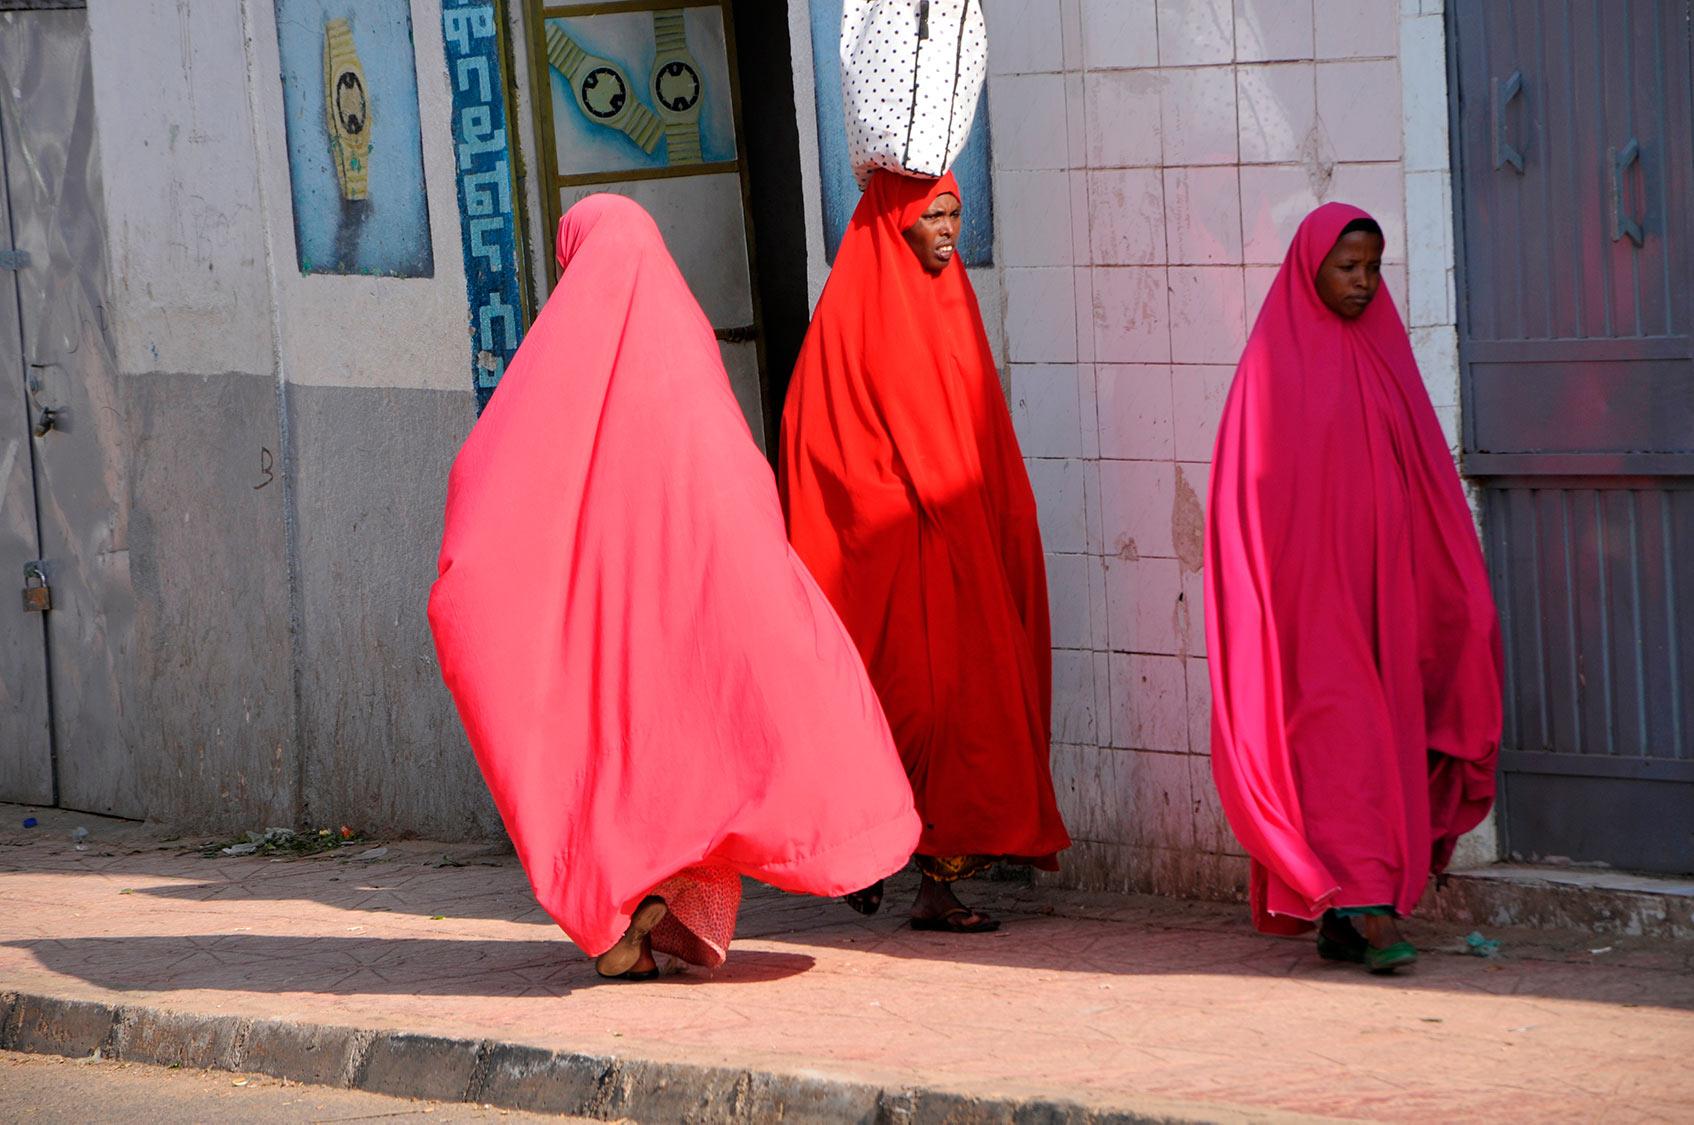 город харэр в эфиопии